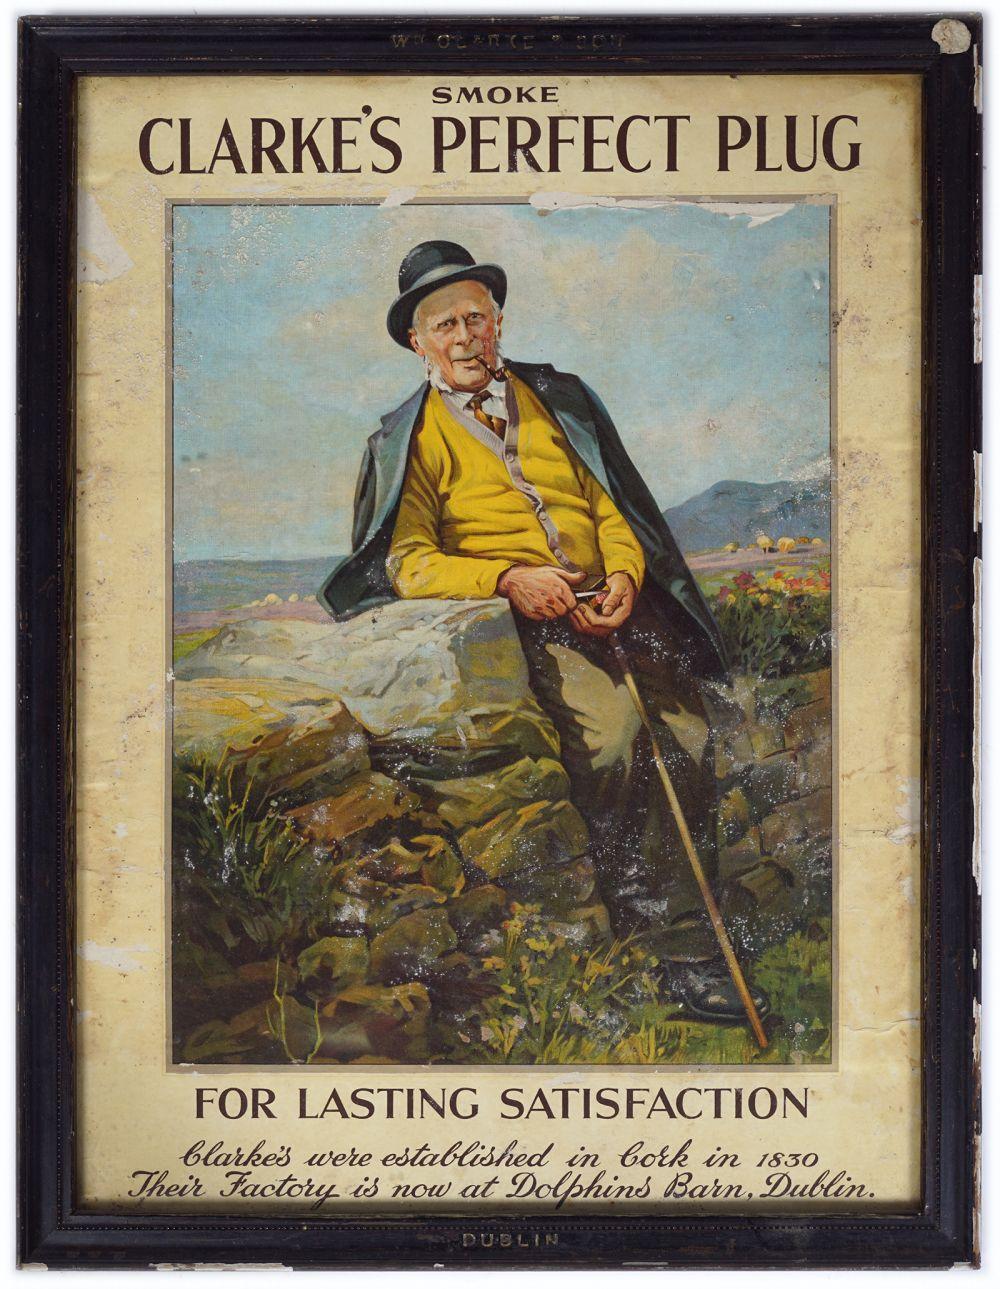 SMOKE CLARKE'S PERFECT PLUG ORIGINAL POSTER